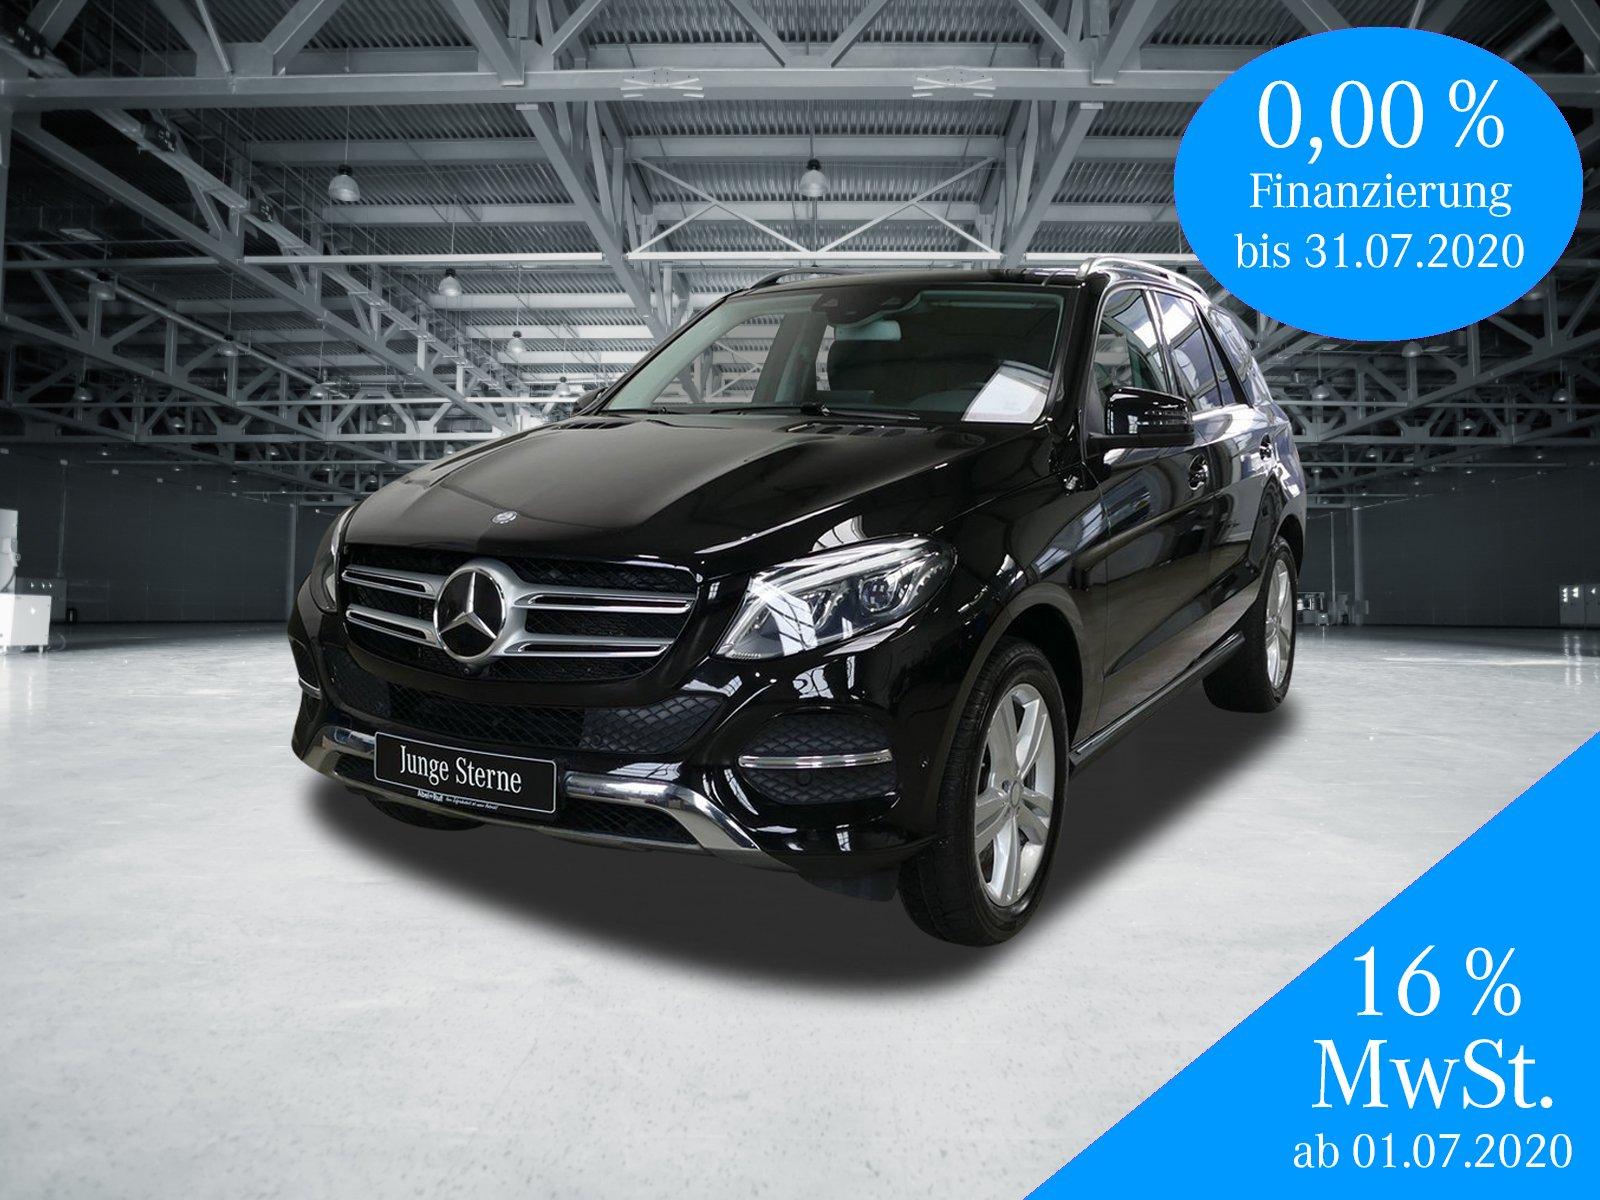 Mercedes-Benz GLE 500 Airmatic+AHK+Distronic+Pano+Massage+LED, Jahr 2016, Benzin